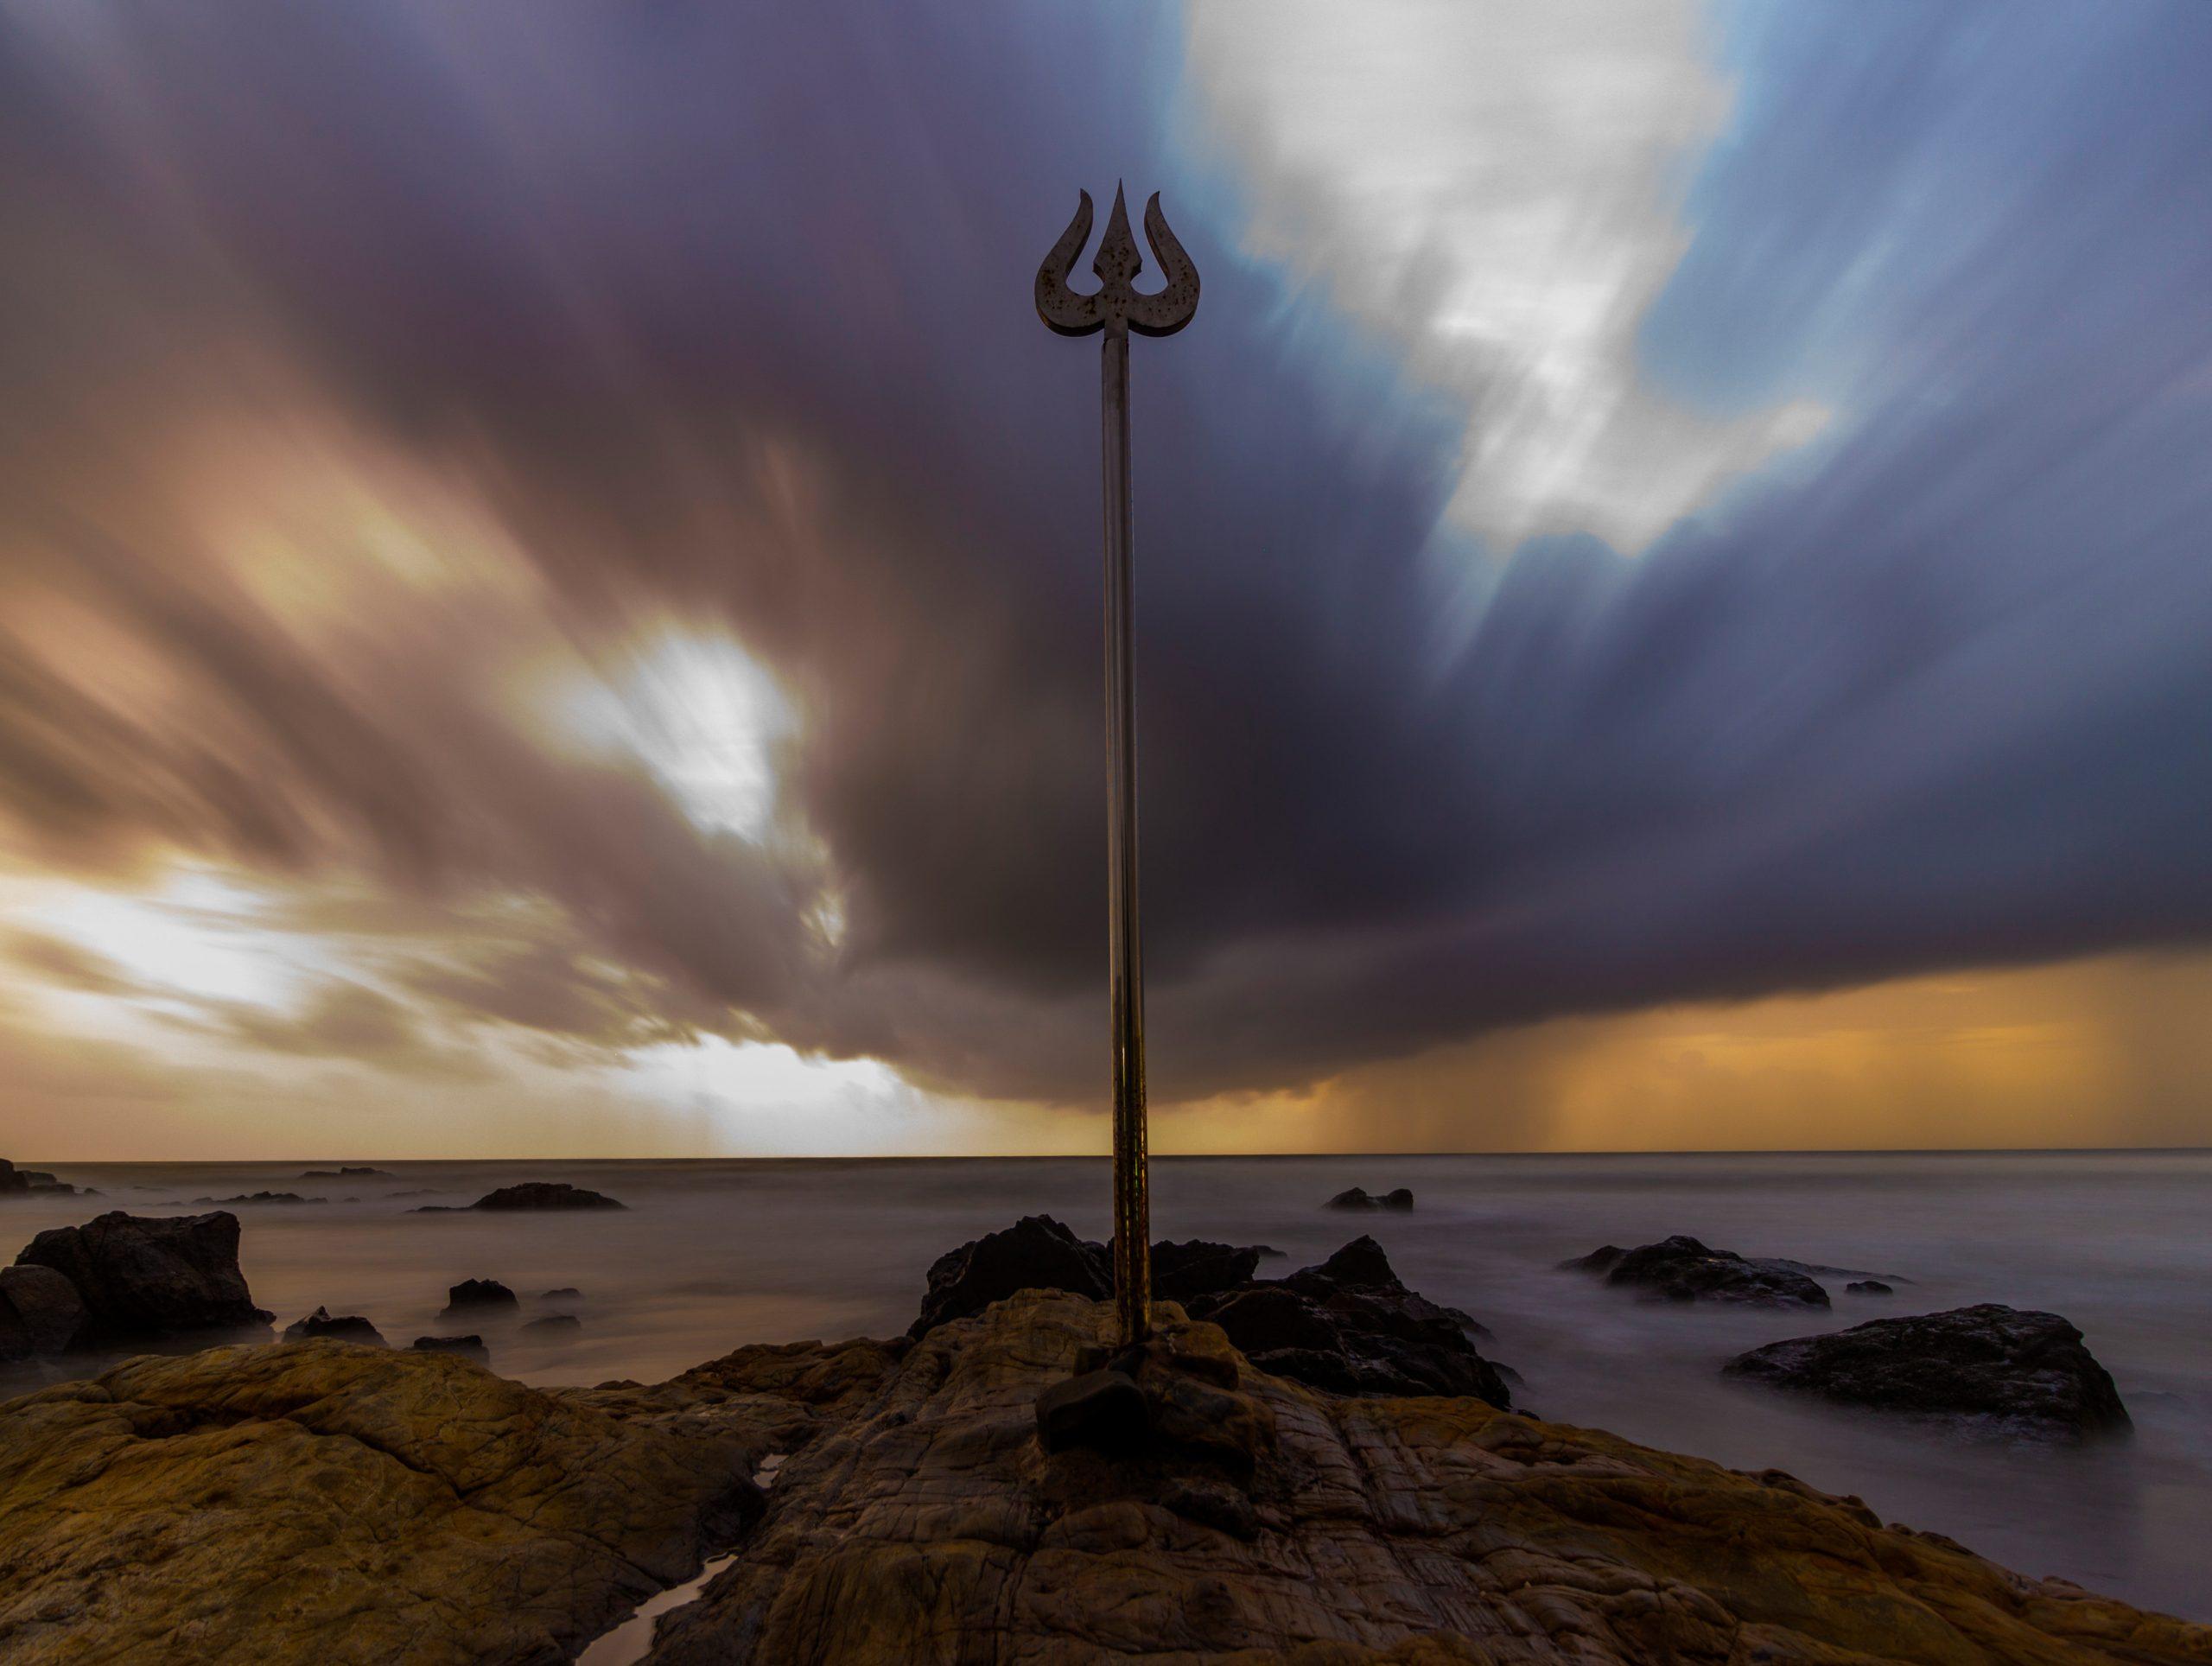 Shiva Trident on a rock